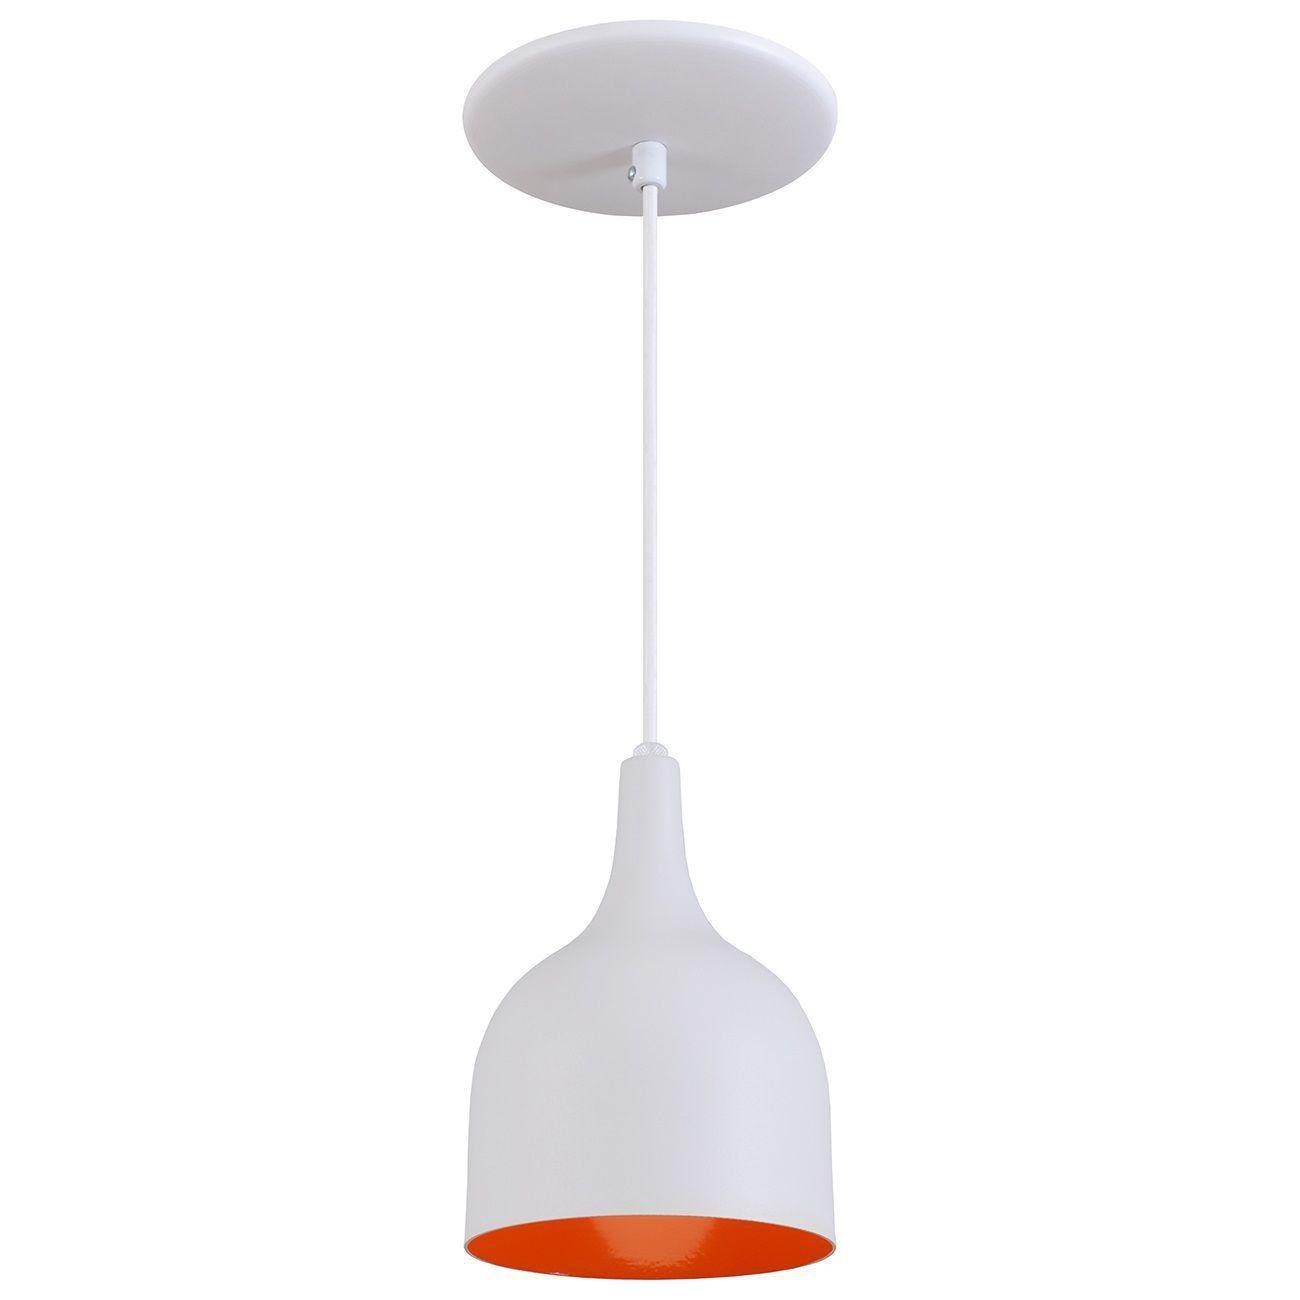 Pendente Gota Teat Luminária Lustre Alumínio Branco Textura C/ Laranja - Rei Da Iluminação